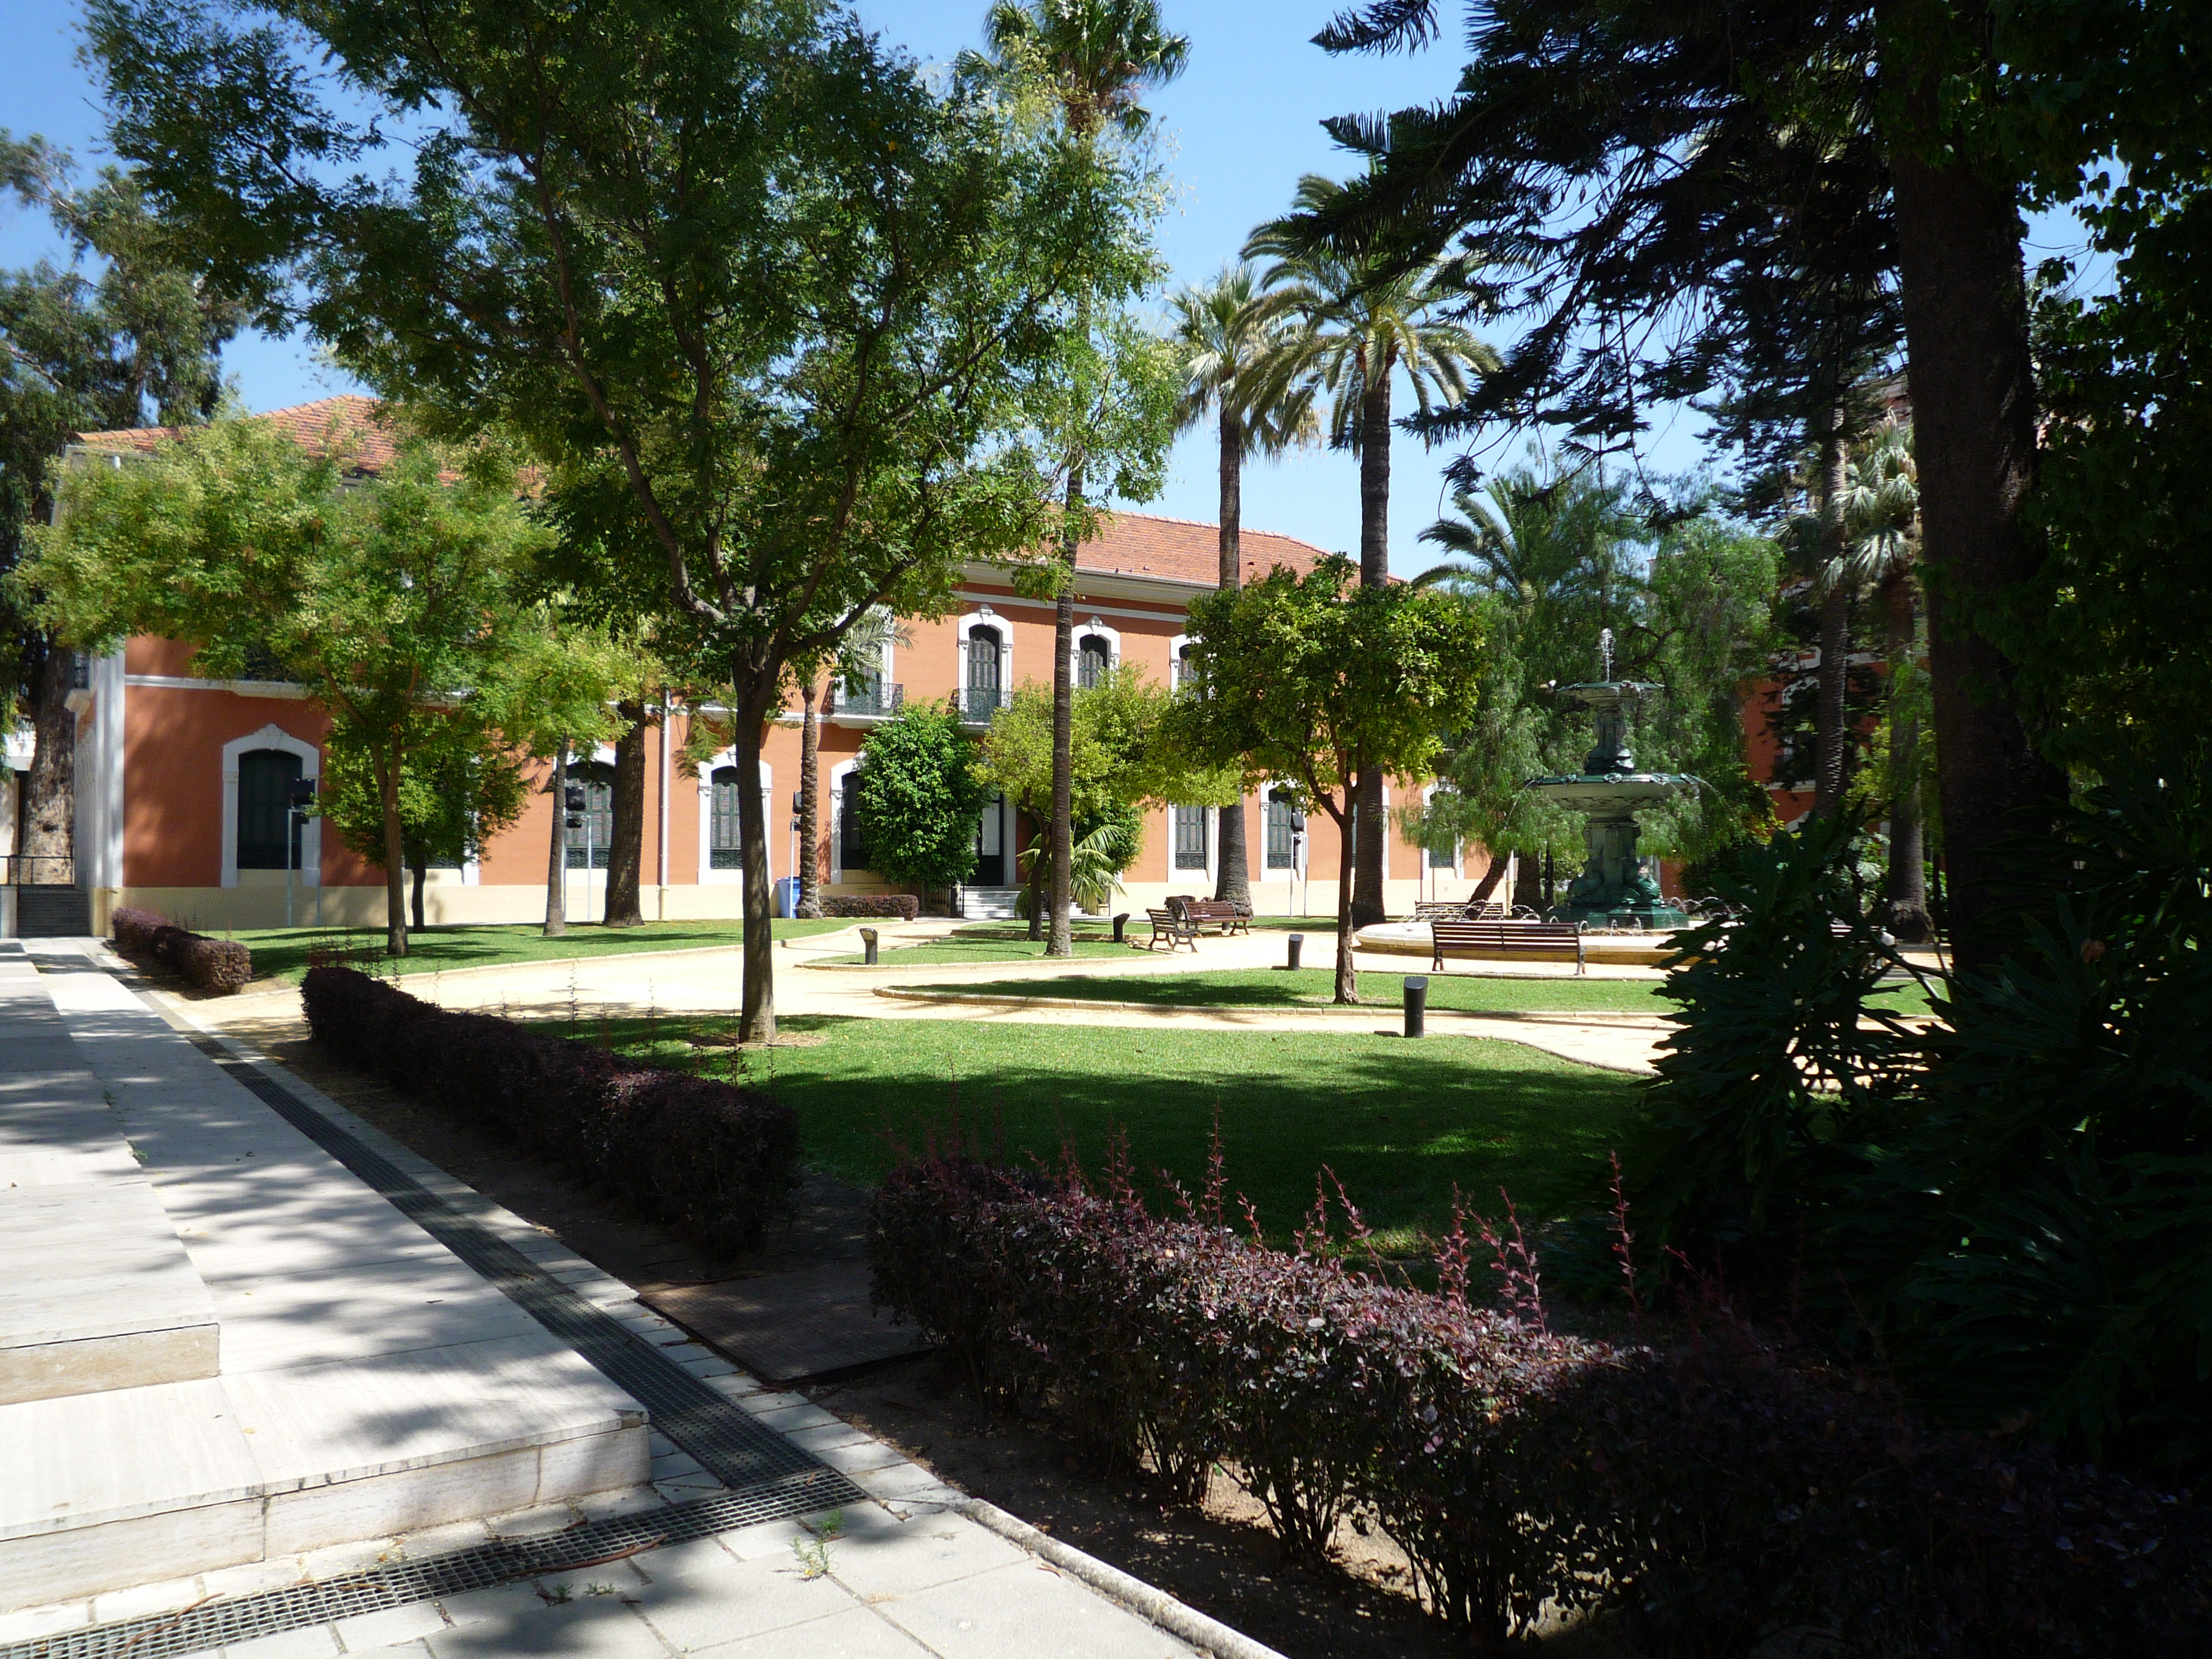 Casa de col n jardines andaluc a soundscape - Casa colon huelva ...